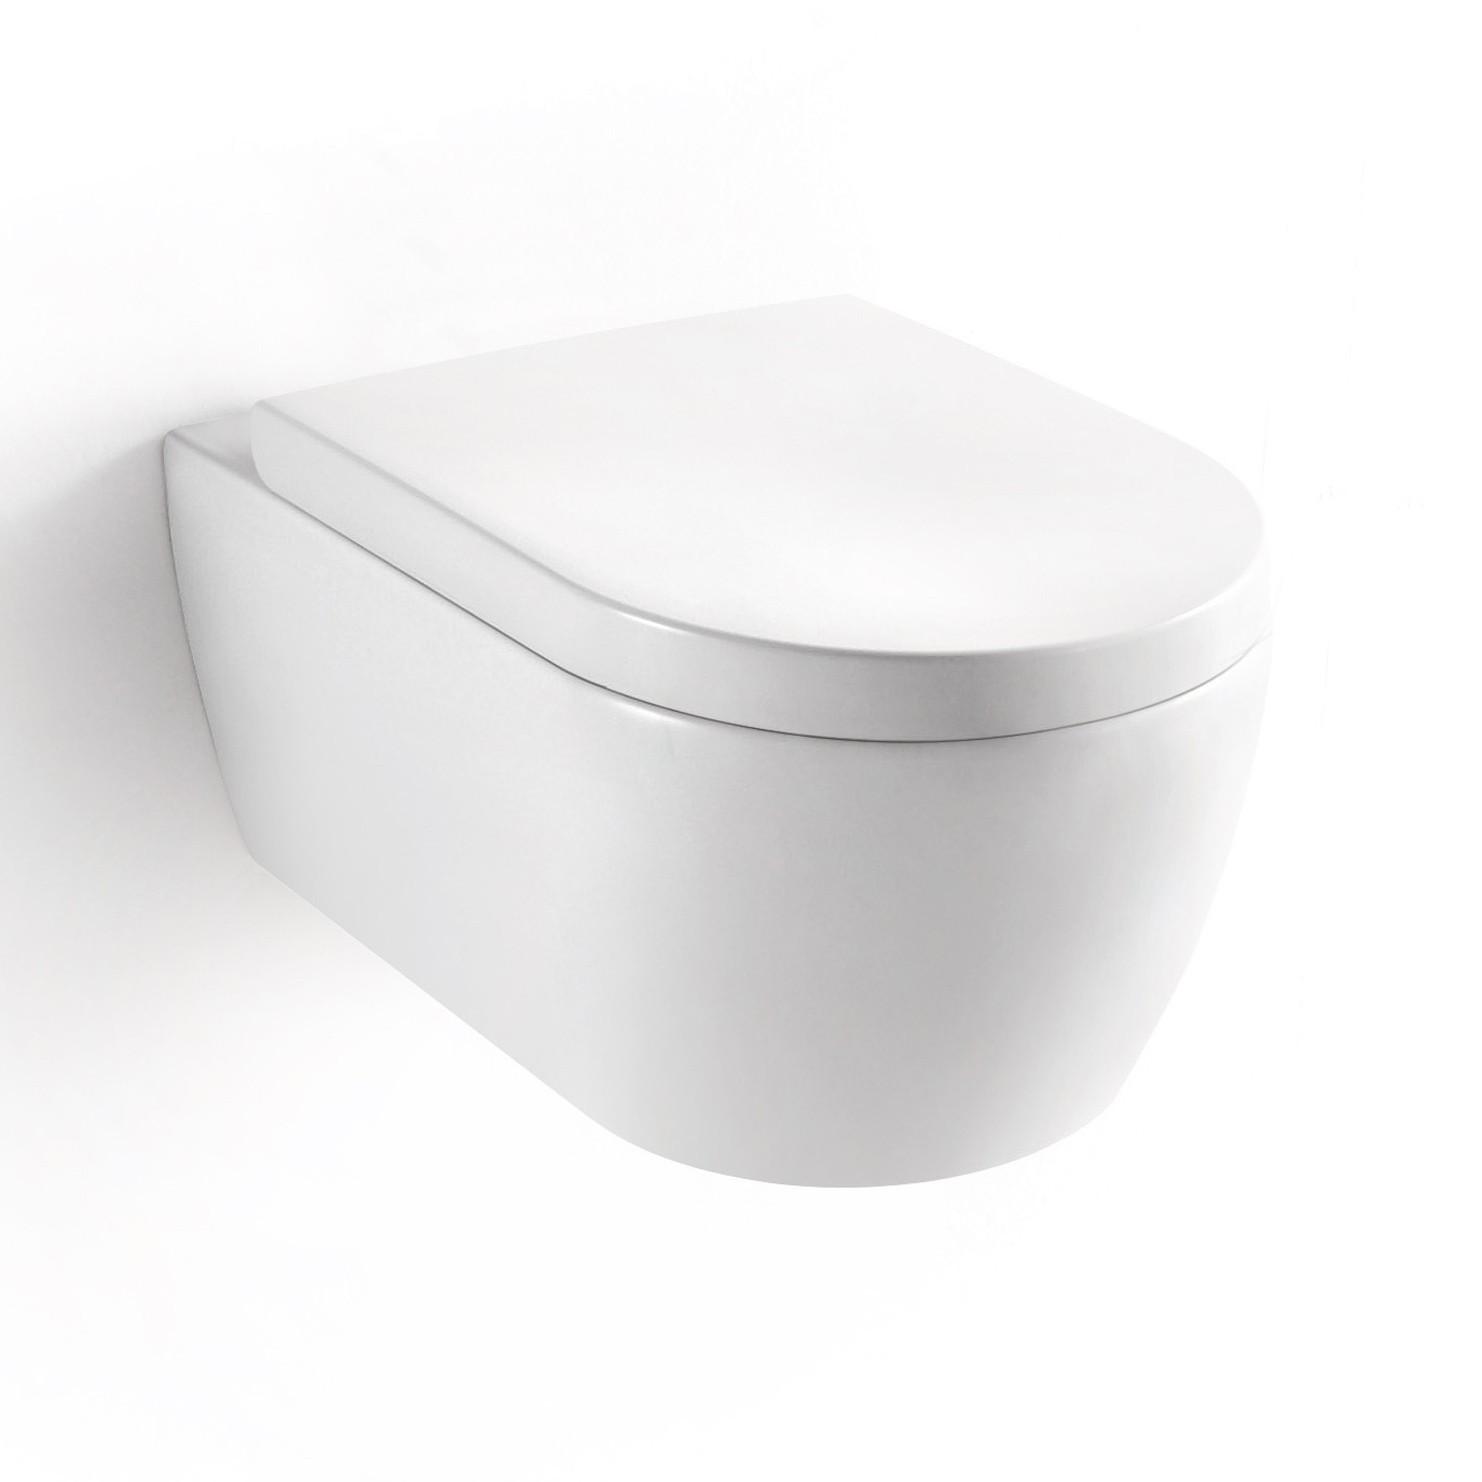 soho h nge wand wc ohne untersp lrand toilette brillant. Black Bedroom Furniture Sets. Home Design Ideas